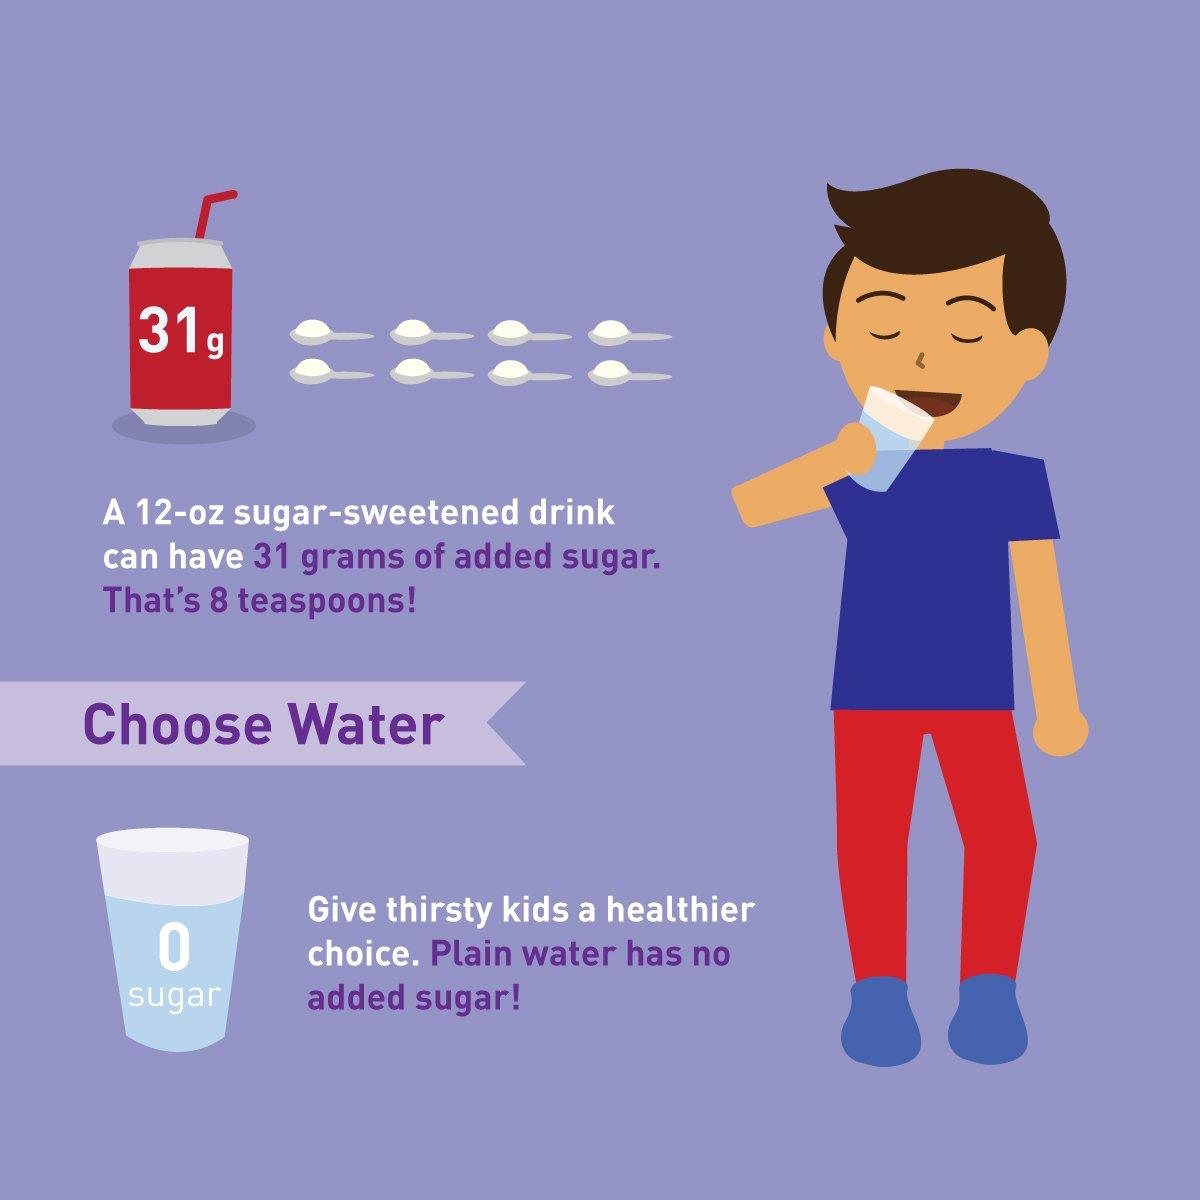 Thirsty? Choose water instead of sugar sweetened beverages. #WorldHealthDay https://t.co/yfBTXl7crv